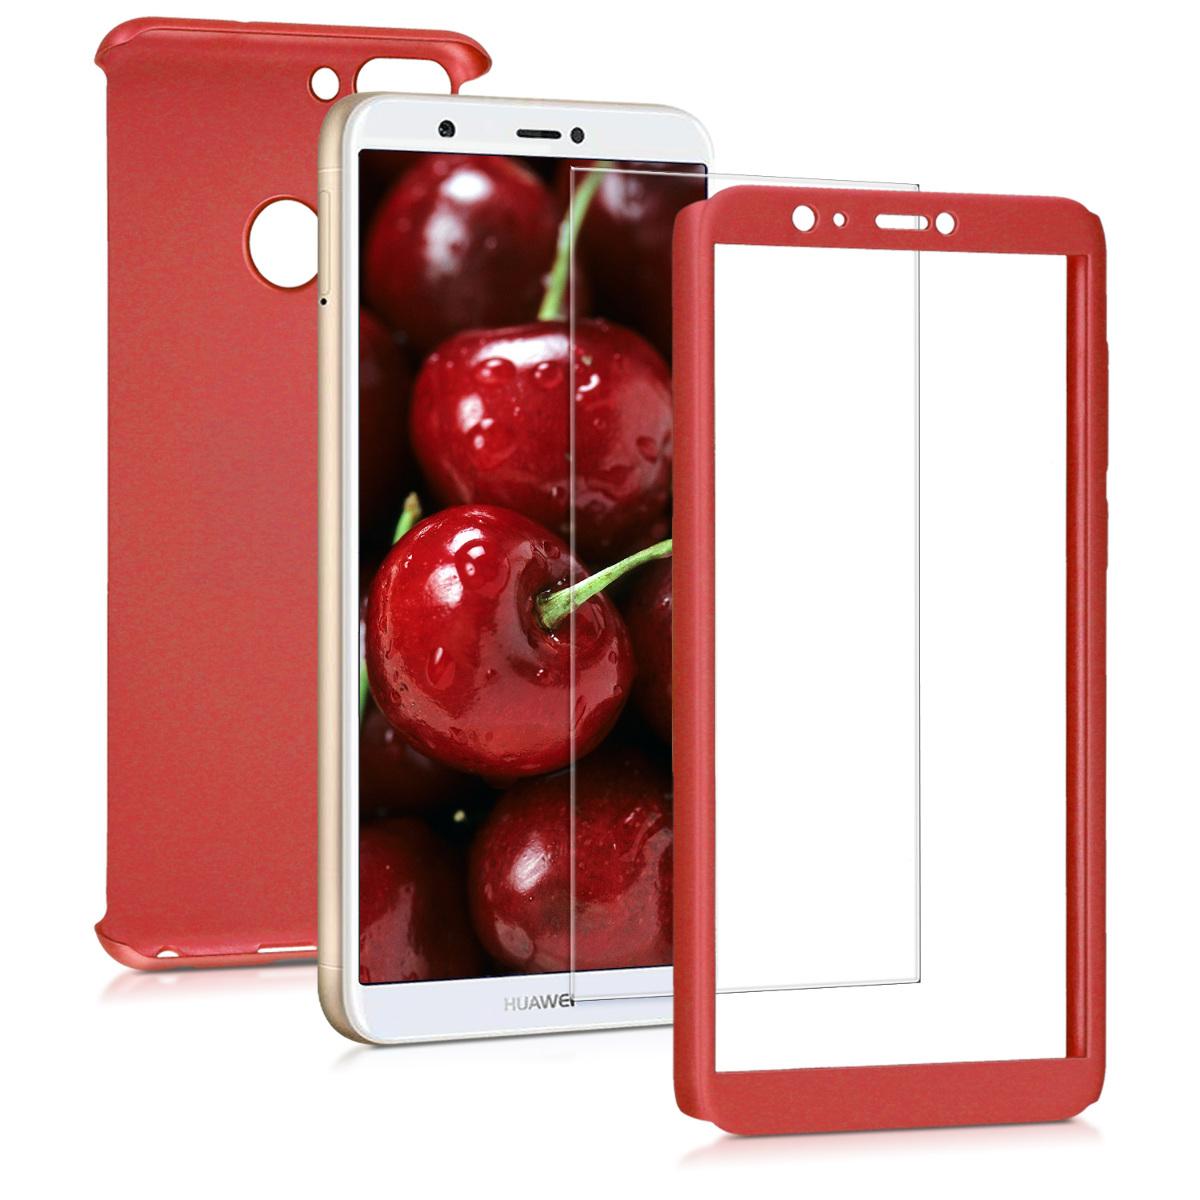 KW Θήκη Full Body Huawei  P Smart 2018 & Tempered Glass - Metallic Dark Red (45559.36)